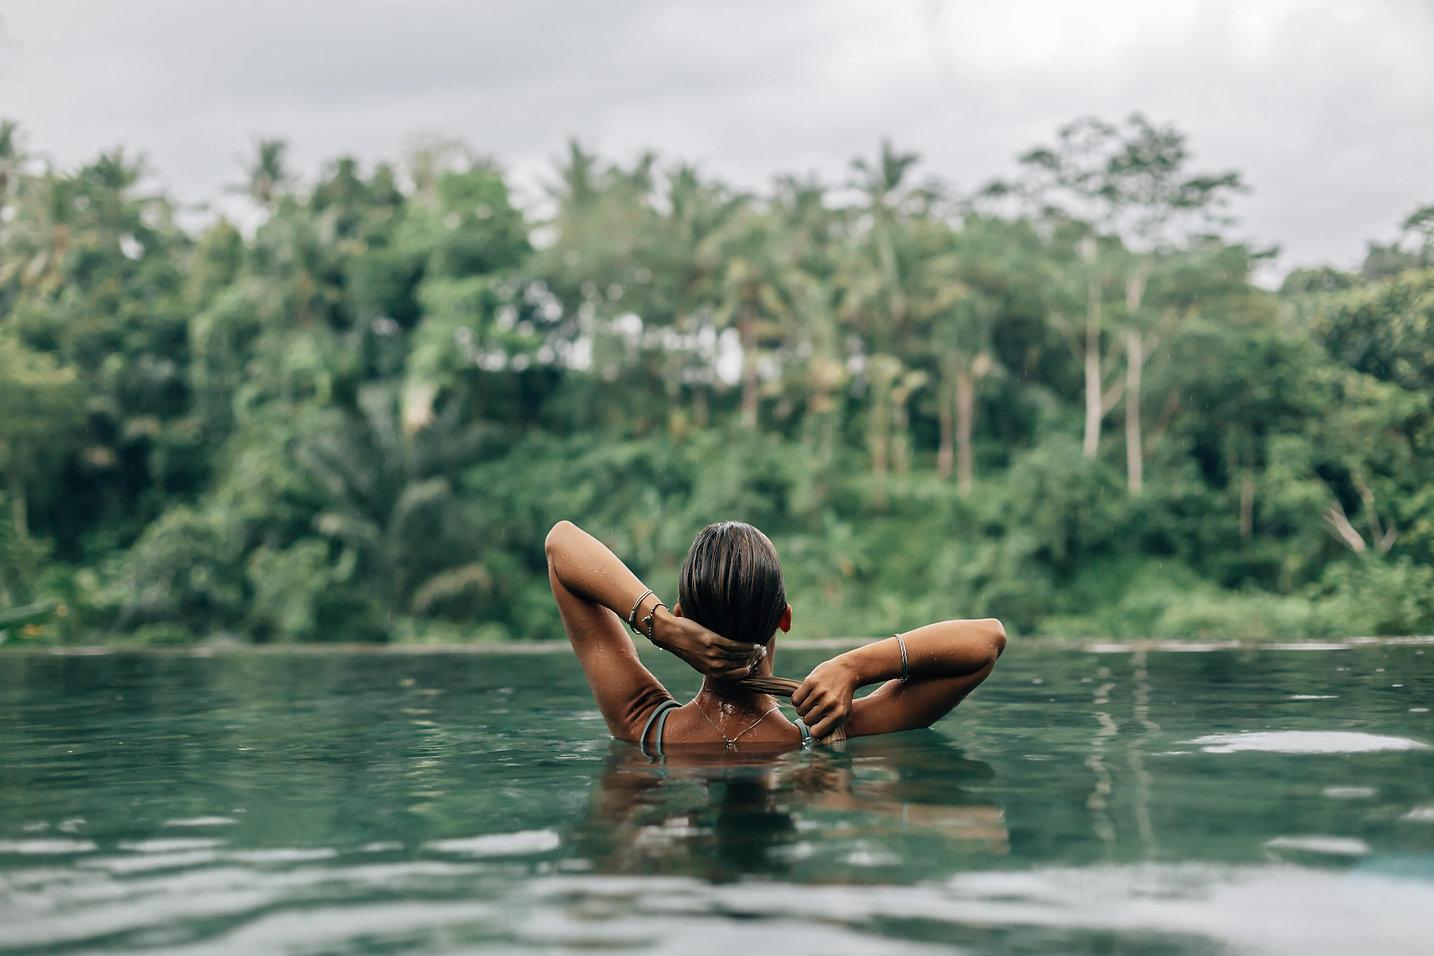 WOMEN IN WATER COMPRESSED.jpeg